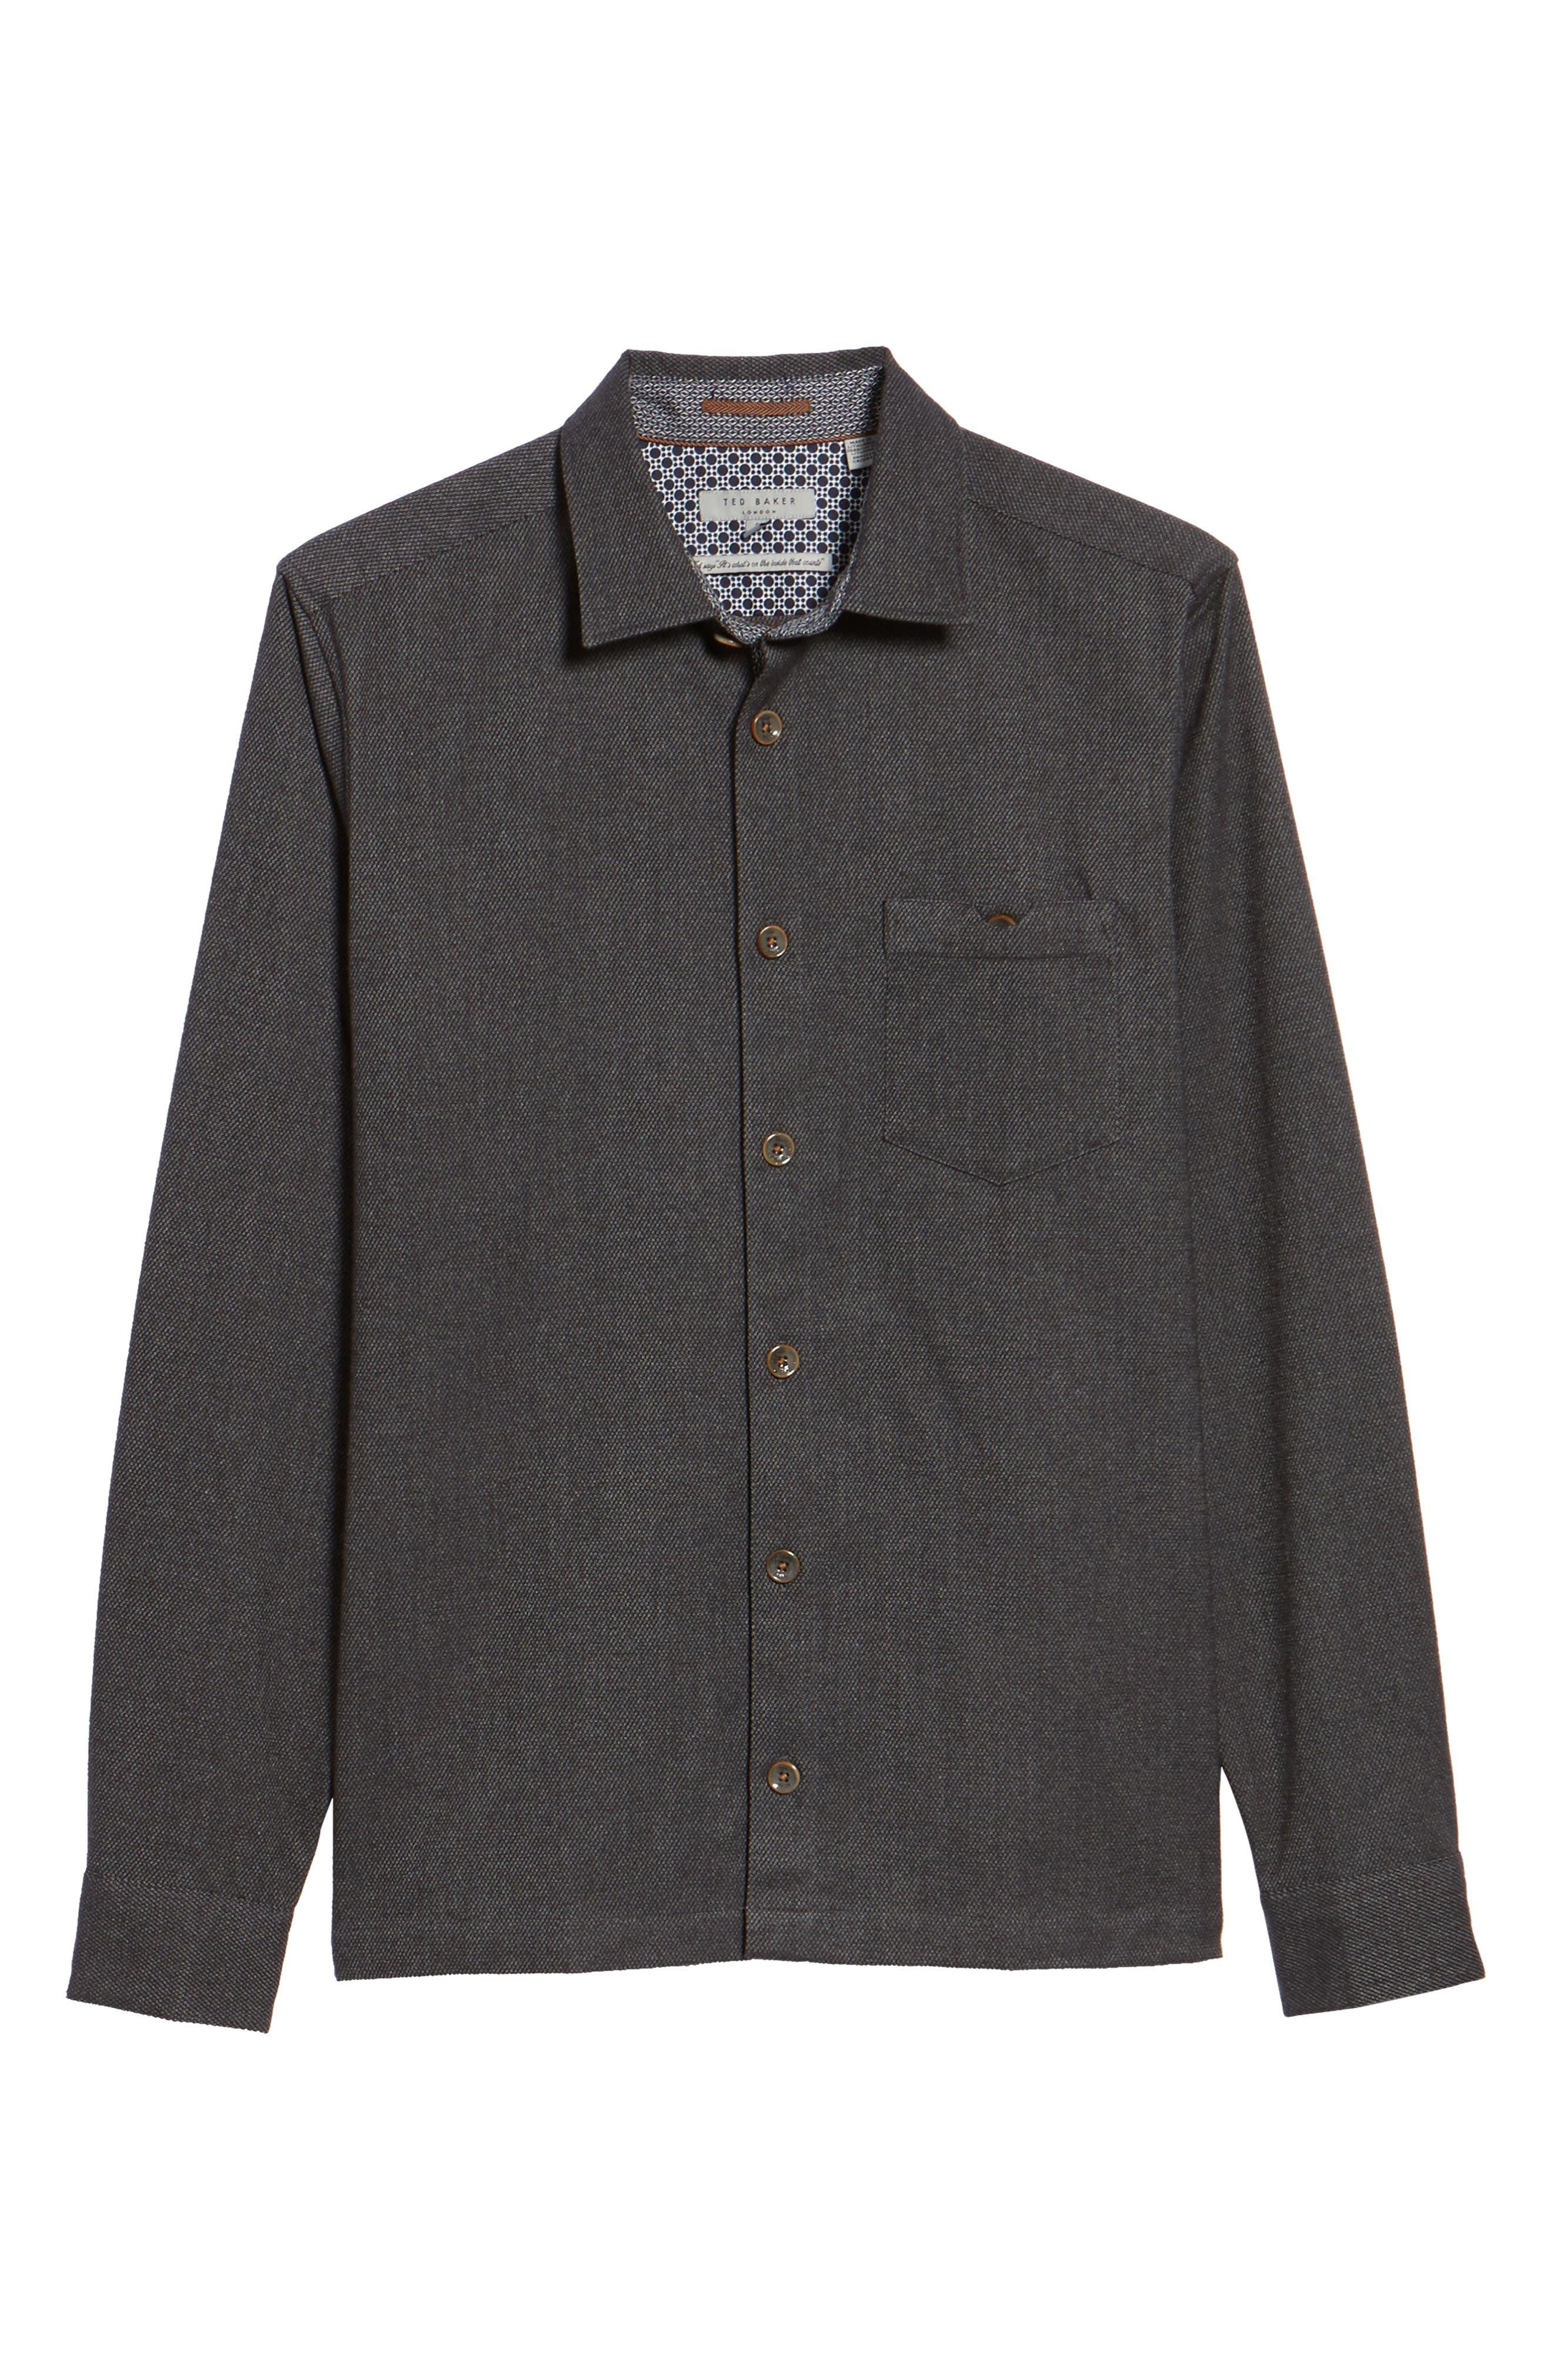 Digon Dobby Shirt,                             Alternate thumbnail 6, color,                             Grey